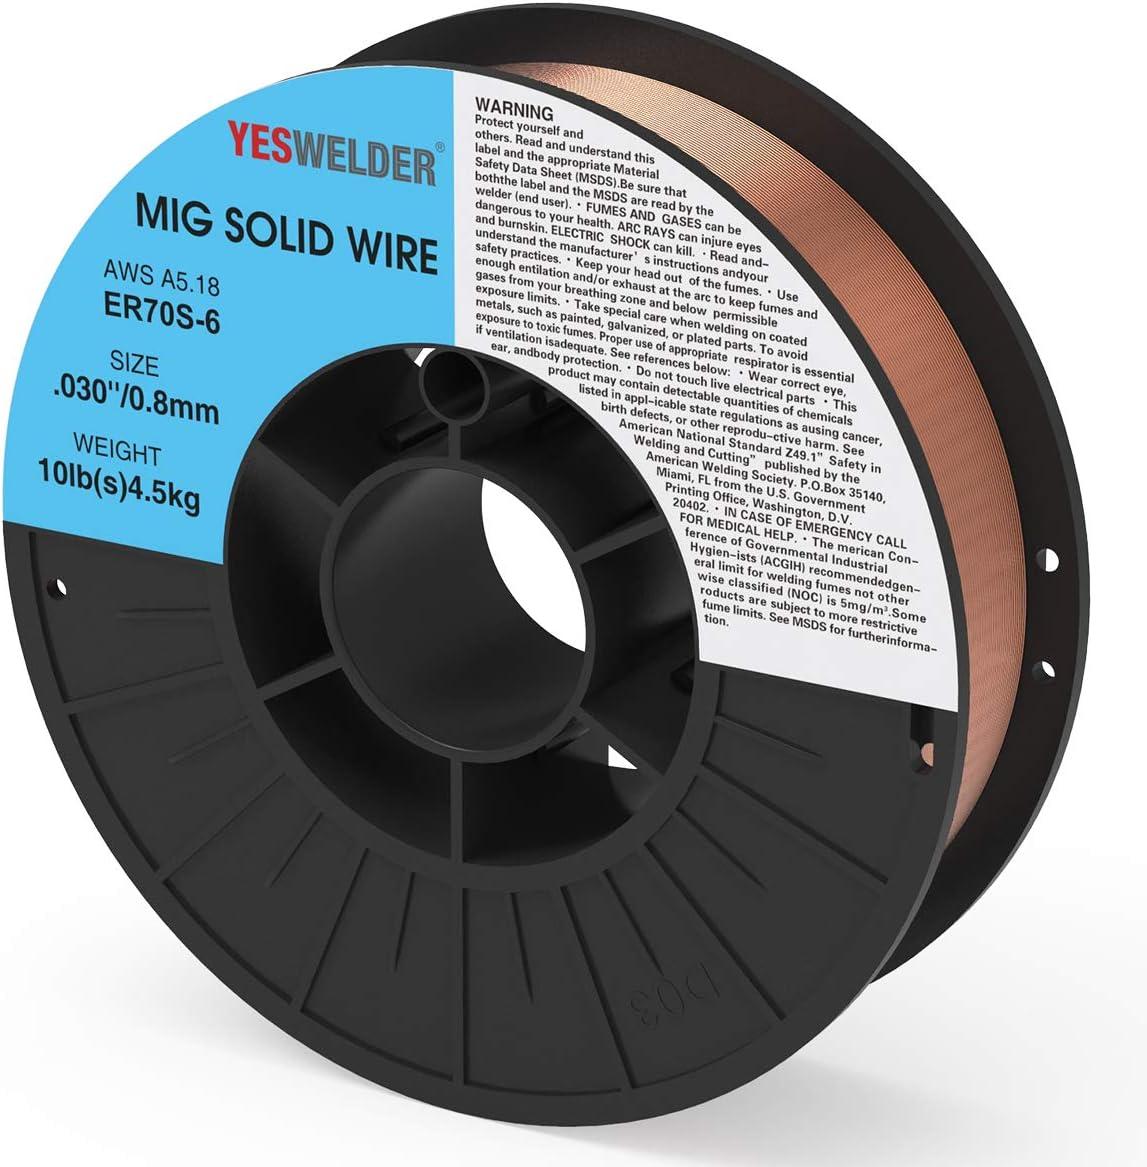 ER70S-6 2 Lb x 0.030 MIG Mild /& Low Alloy Steel Wire 2 SPOOLS